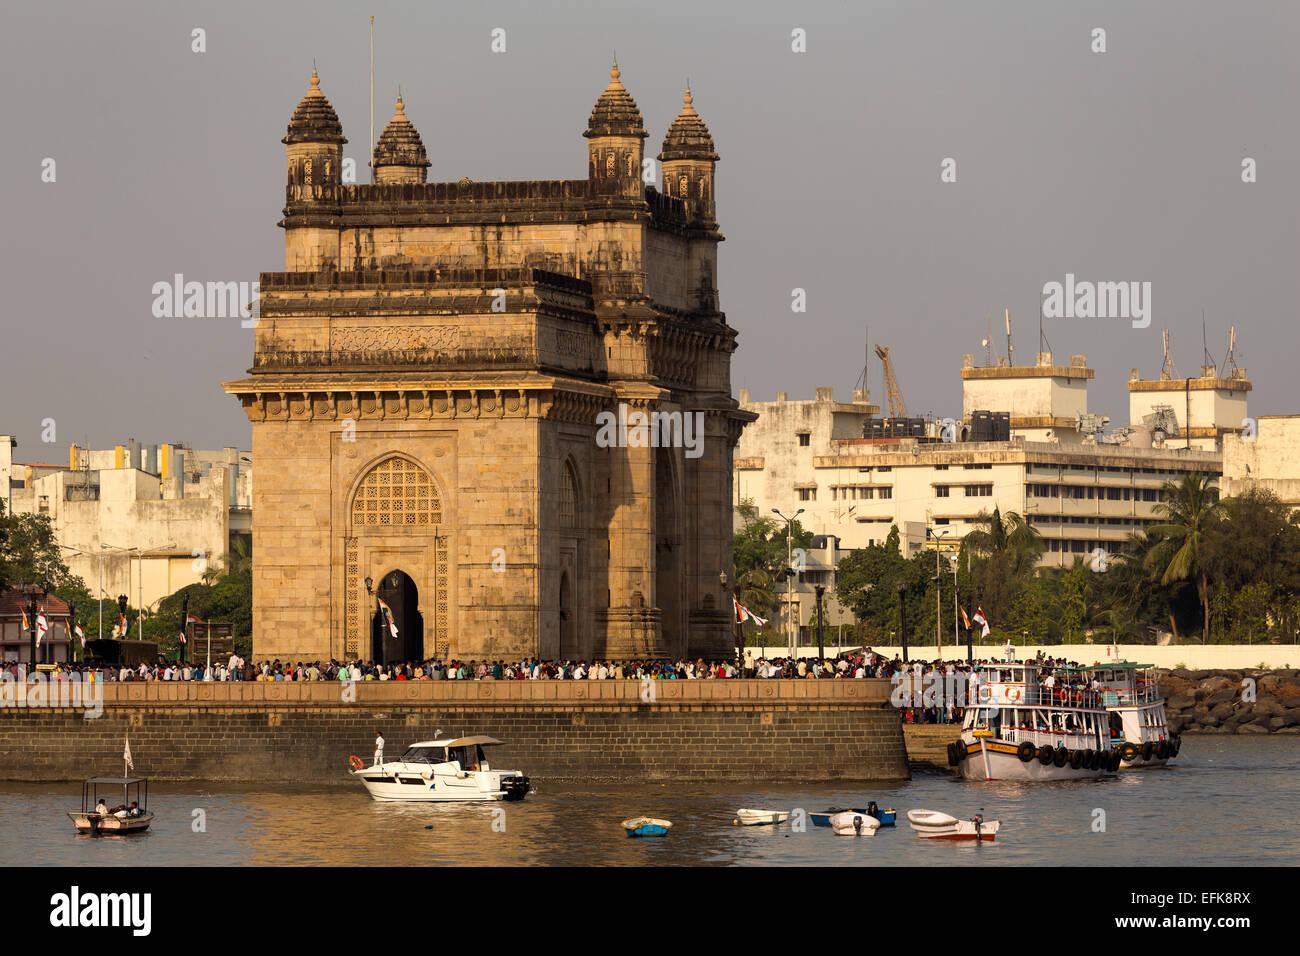 En Maharashtra, India, Mumbai, la puerta de la India y del puerto Imagen De Stock